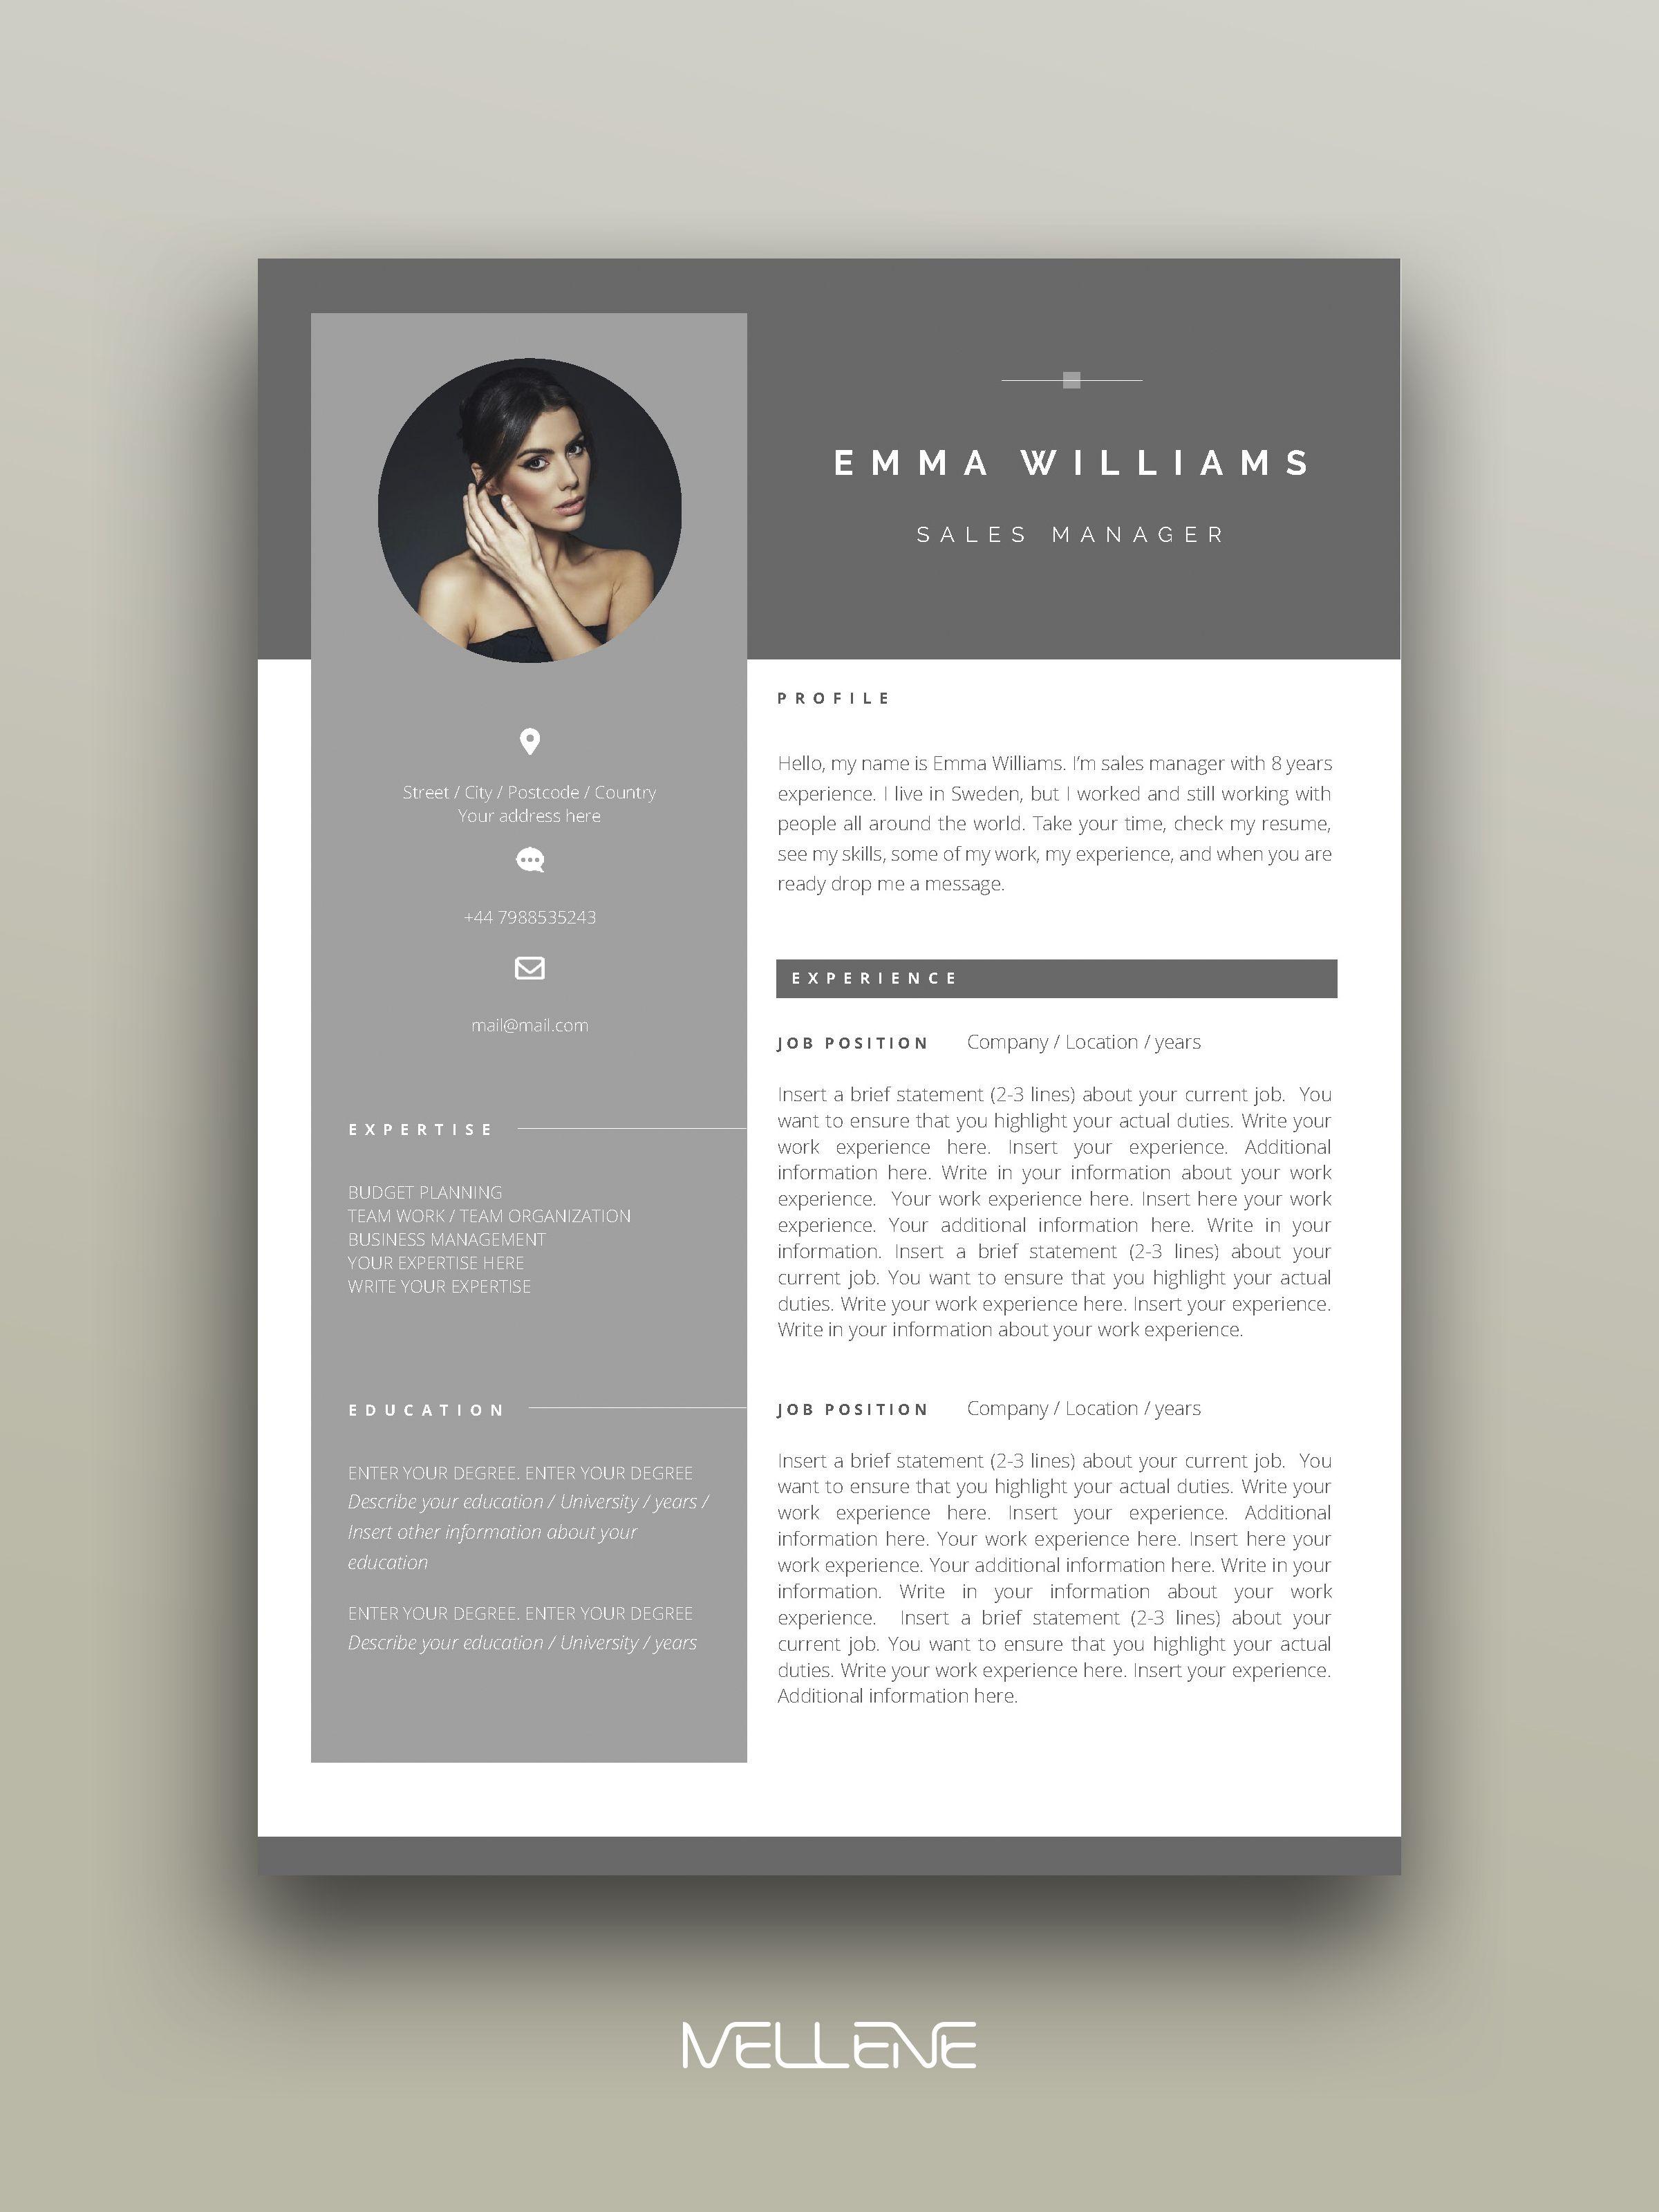 Cv Resume Template For Ms Word Professional Cover Letter Self Presentation Branding Design Graphic Design Resume Resume Design Creative Resume Design